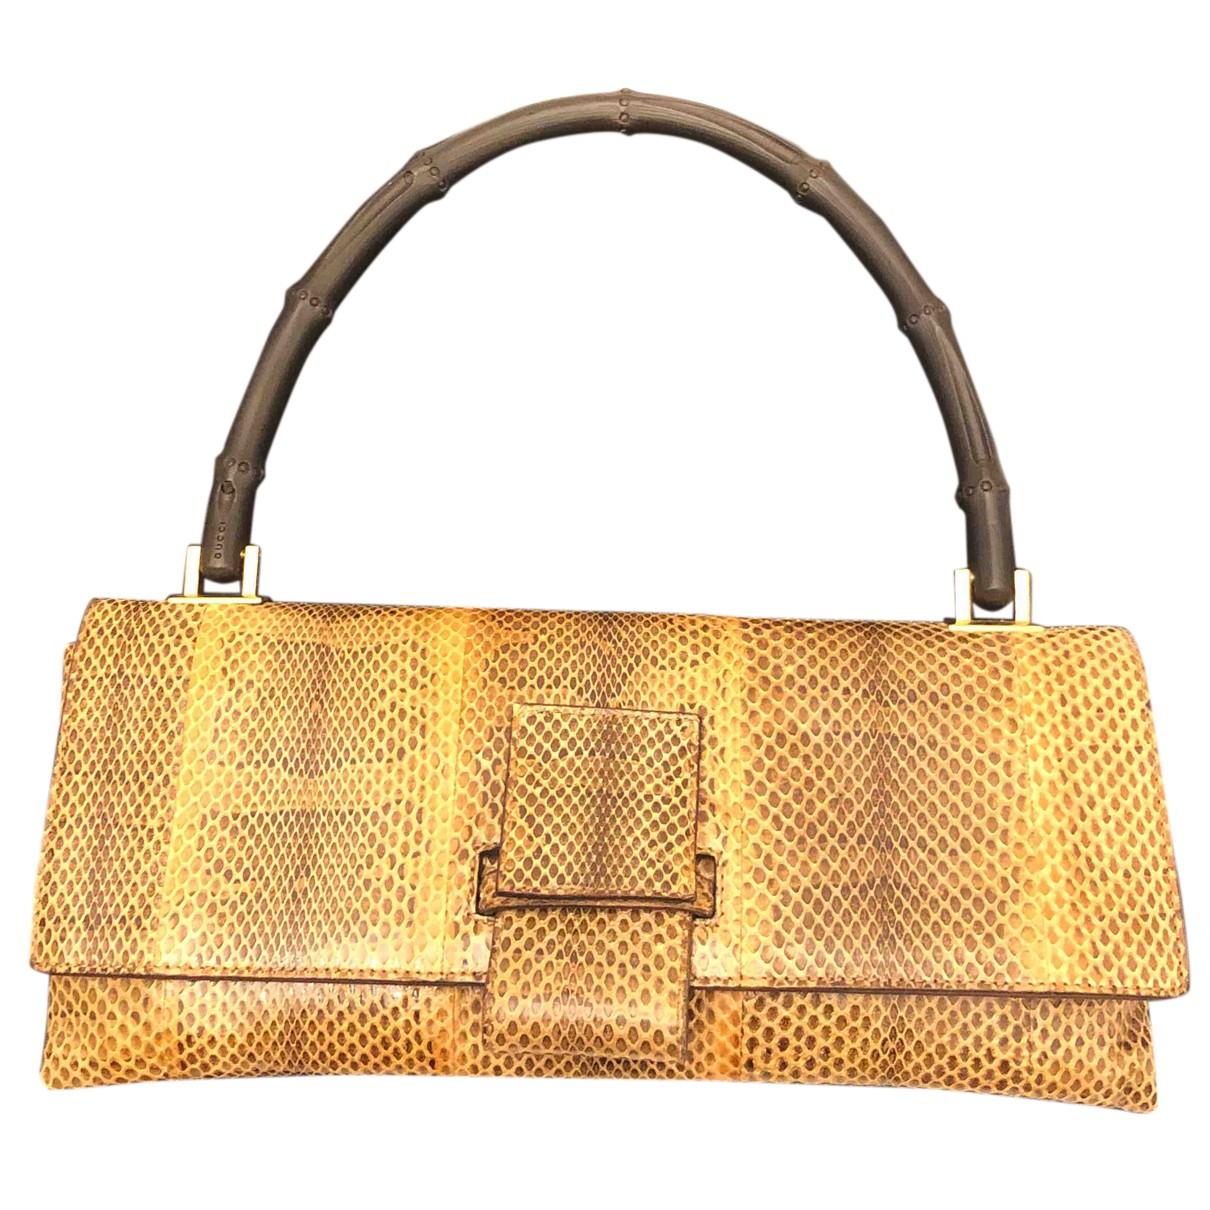 Gucci N Brown Water snake Clutch bag for Women N